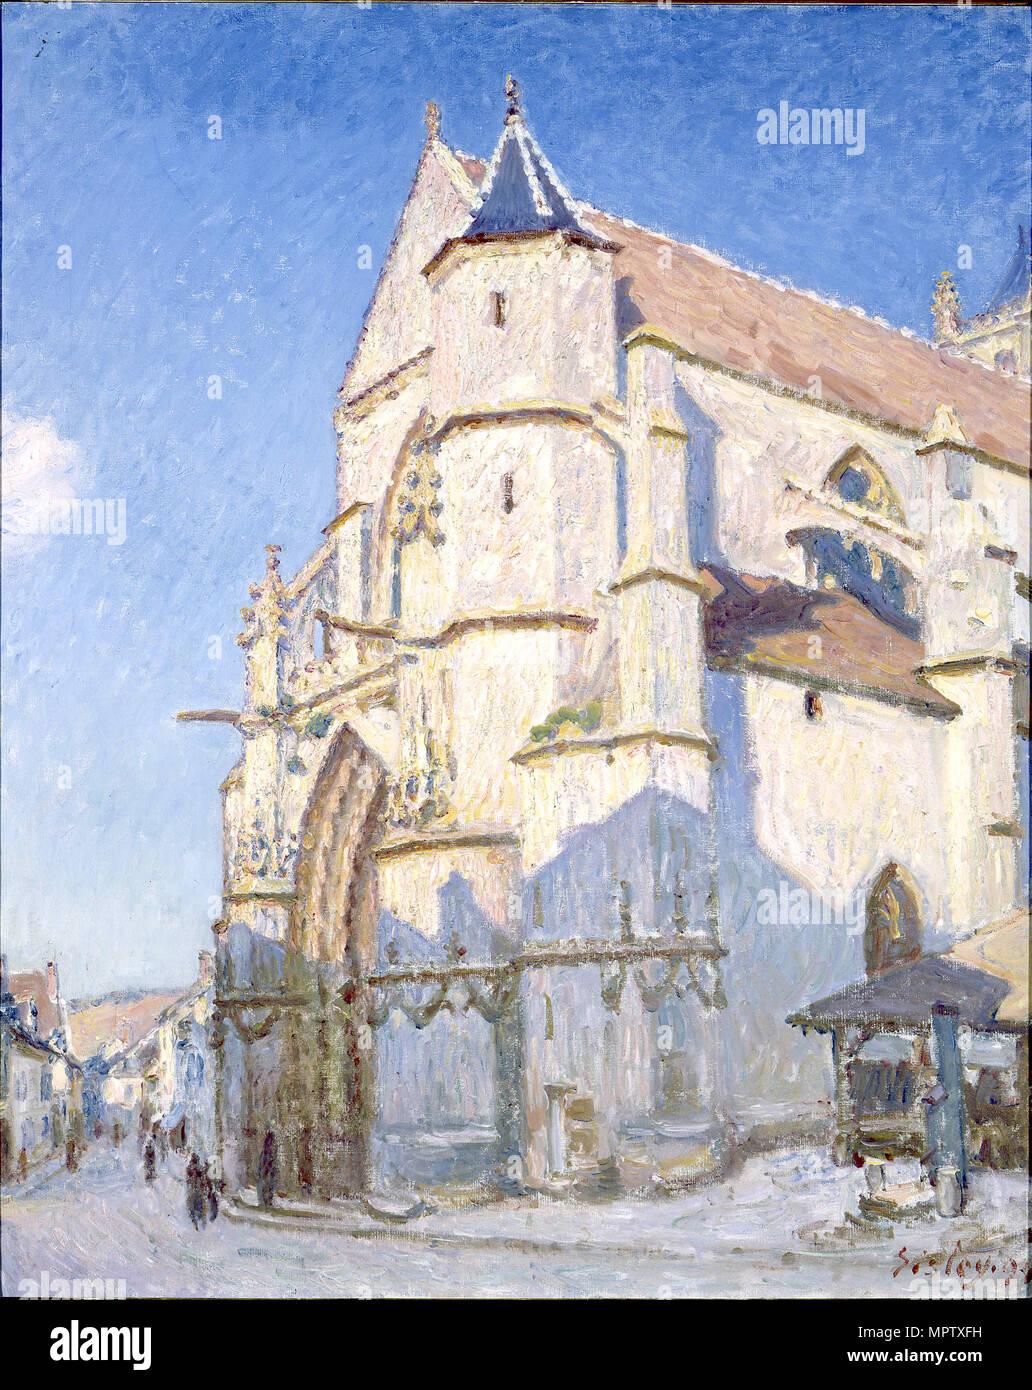 La Iglesia de Moret (noche). Foto de stock